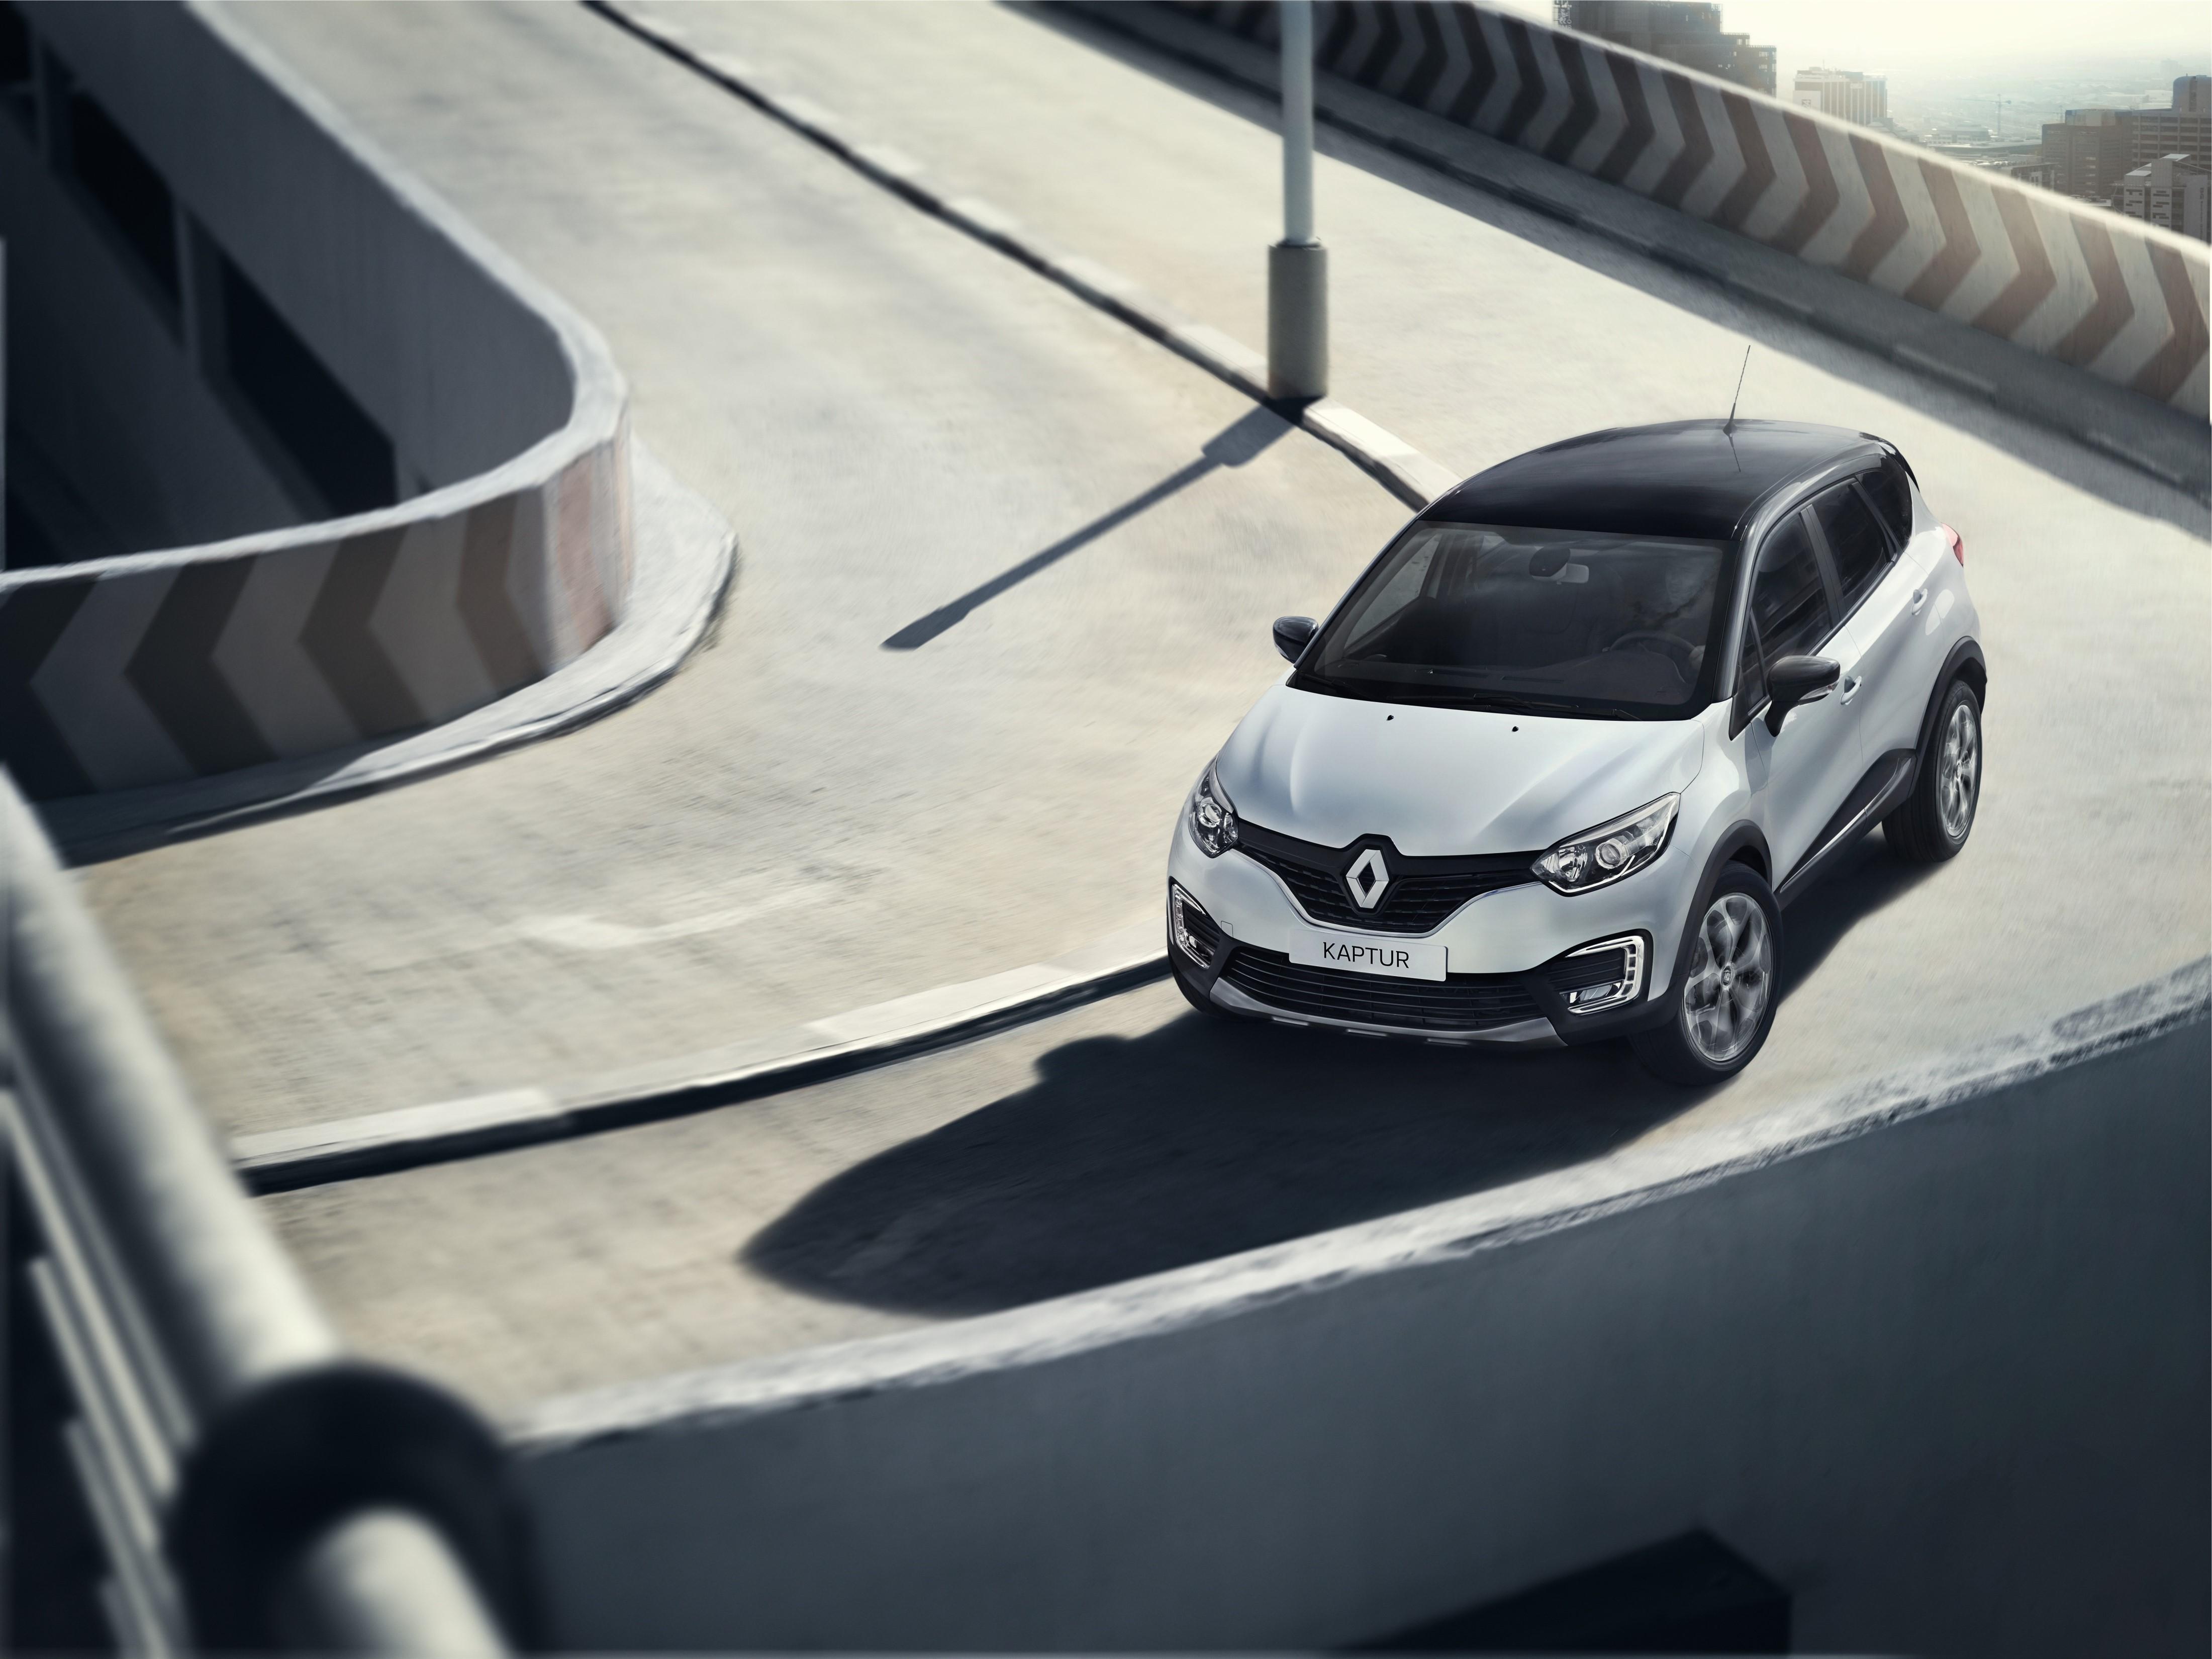 Renault Kaptur images (1)